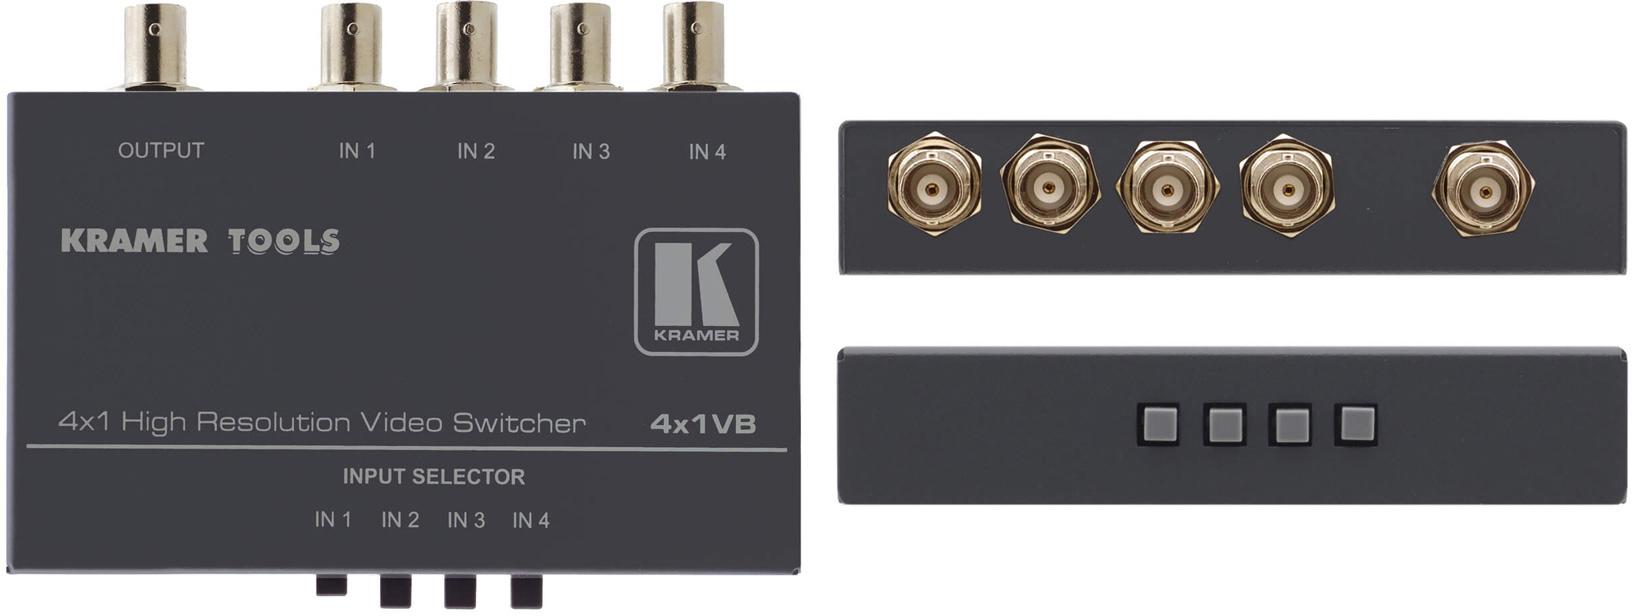 Kramer 4X1VB -- 4x1 Video Switcher w/BNC KR-4X1VB